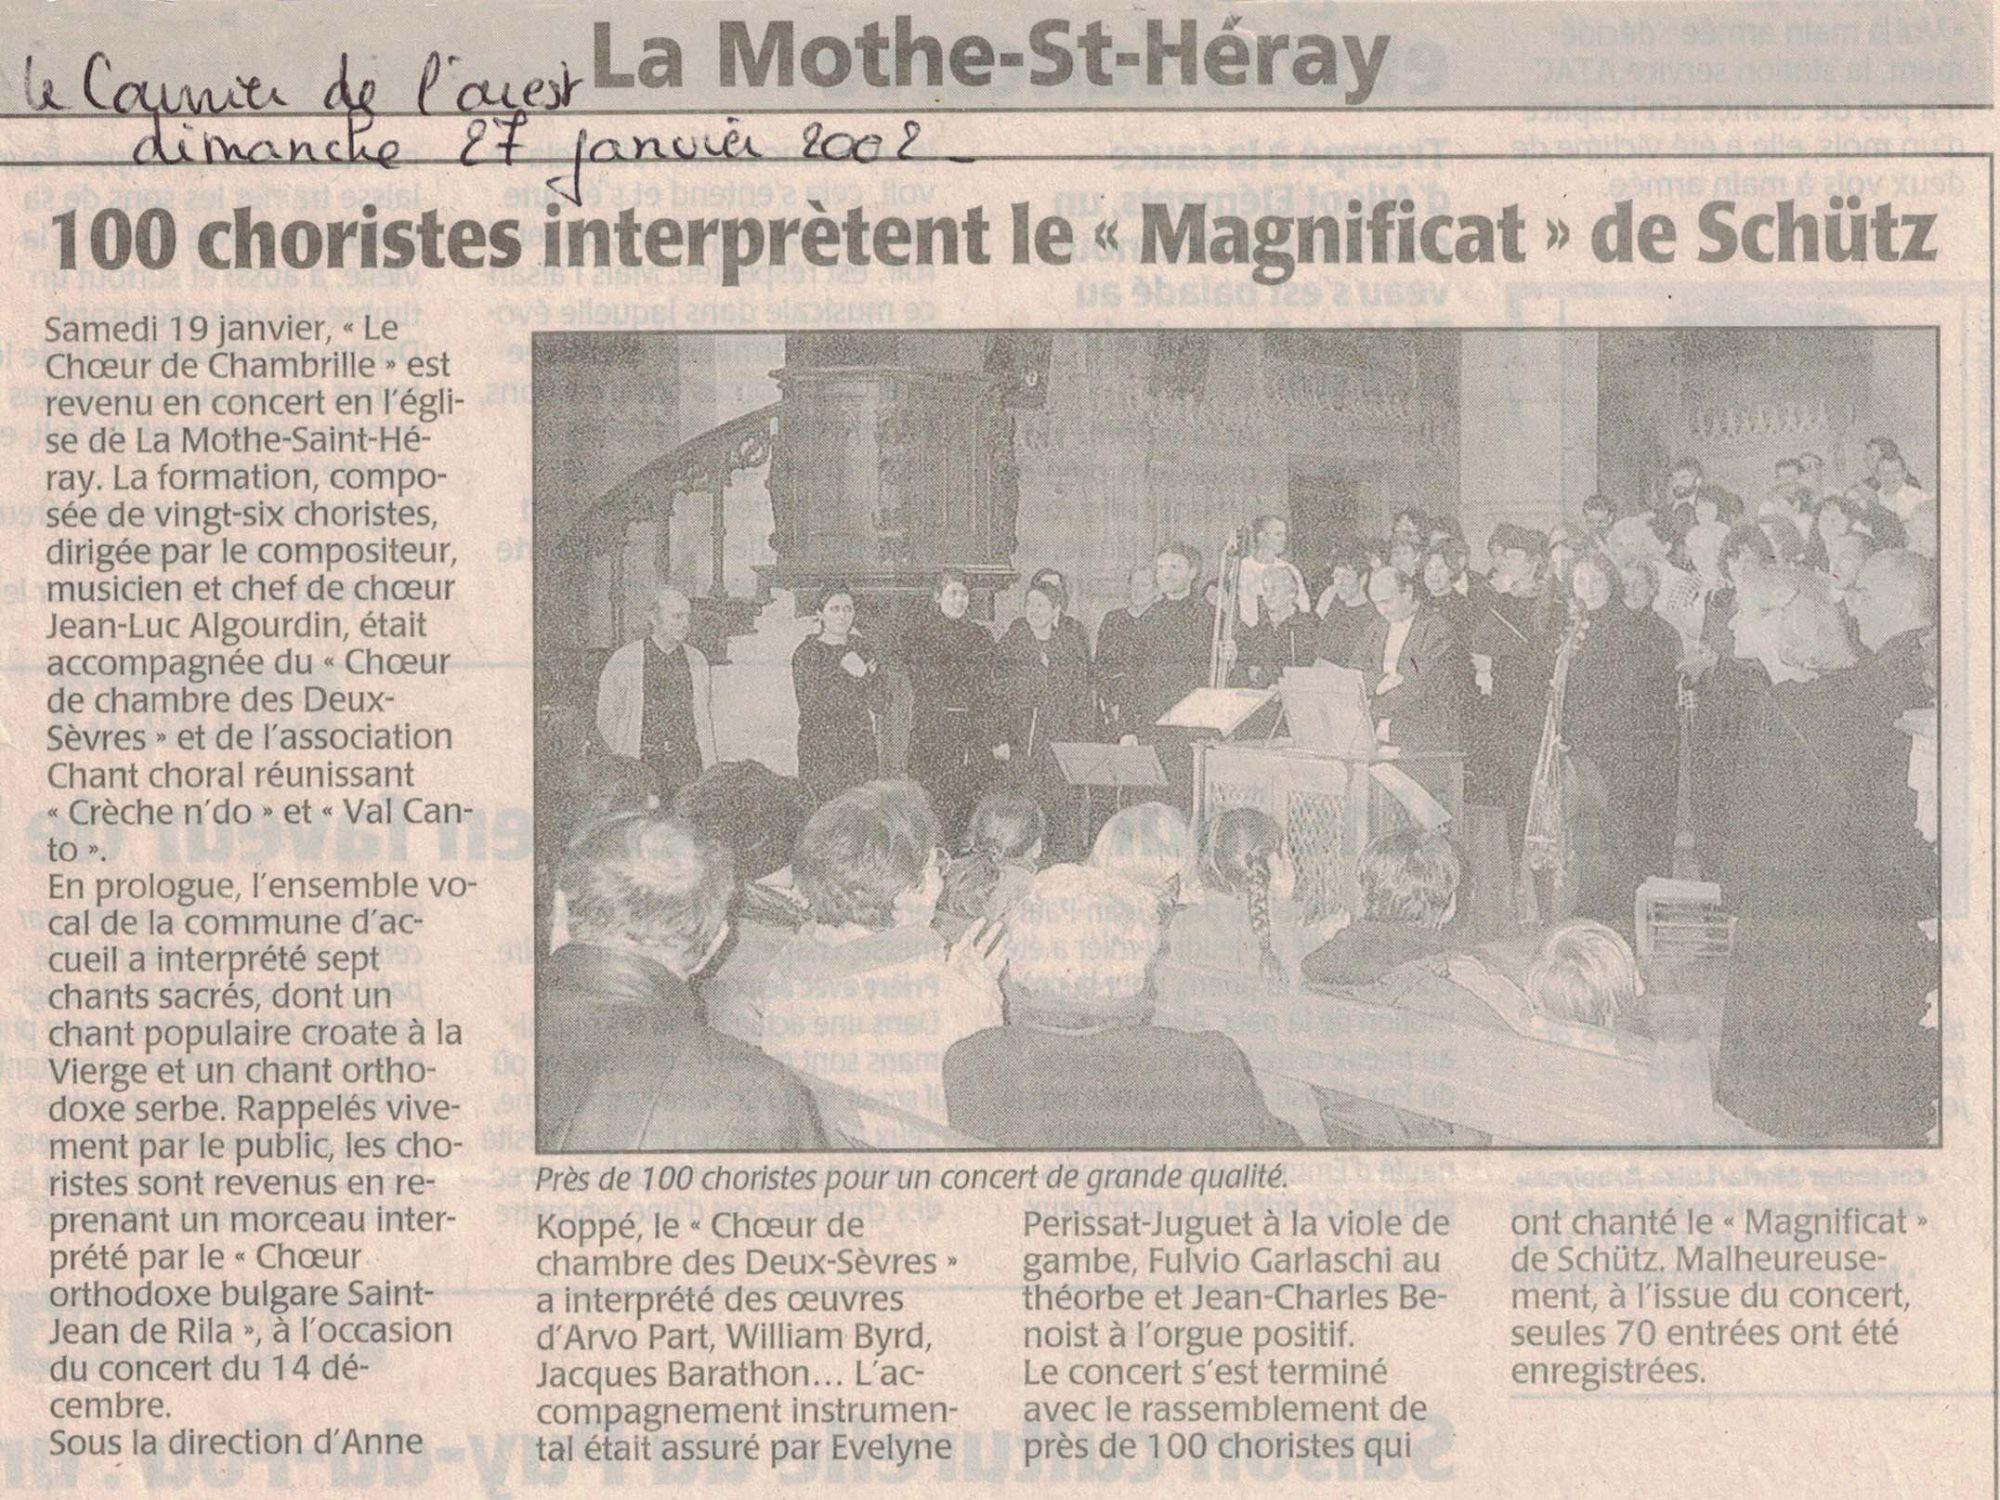 La Mothe St-Heray 1 2002